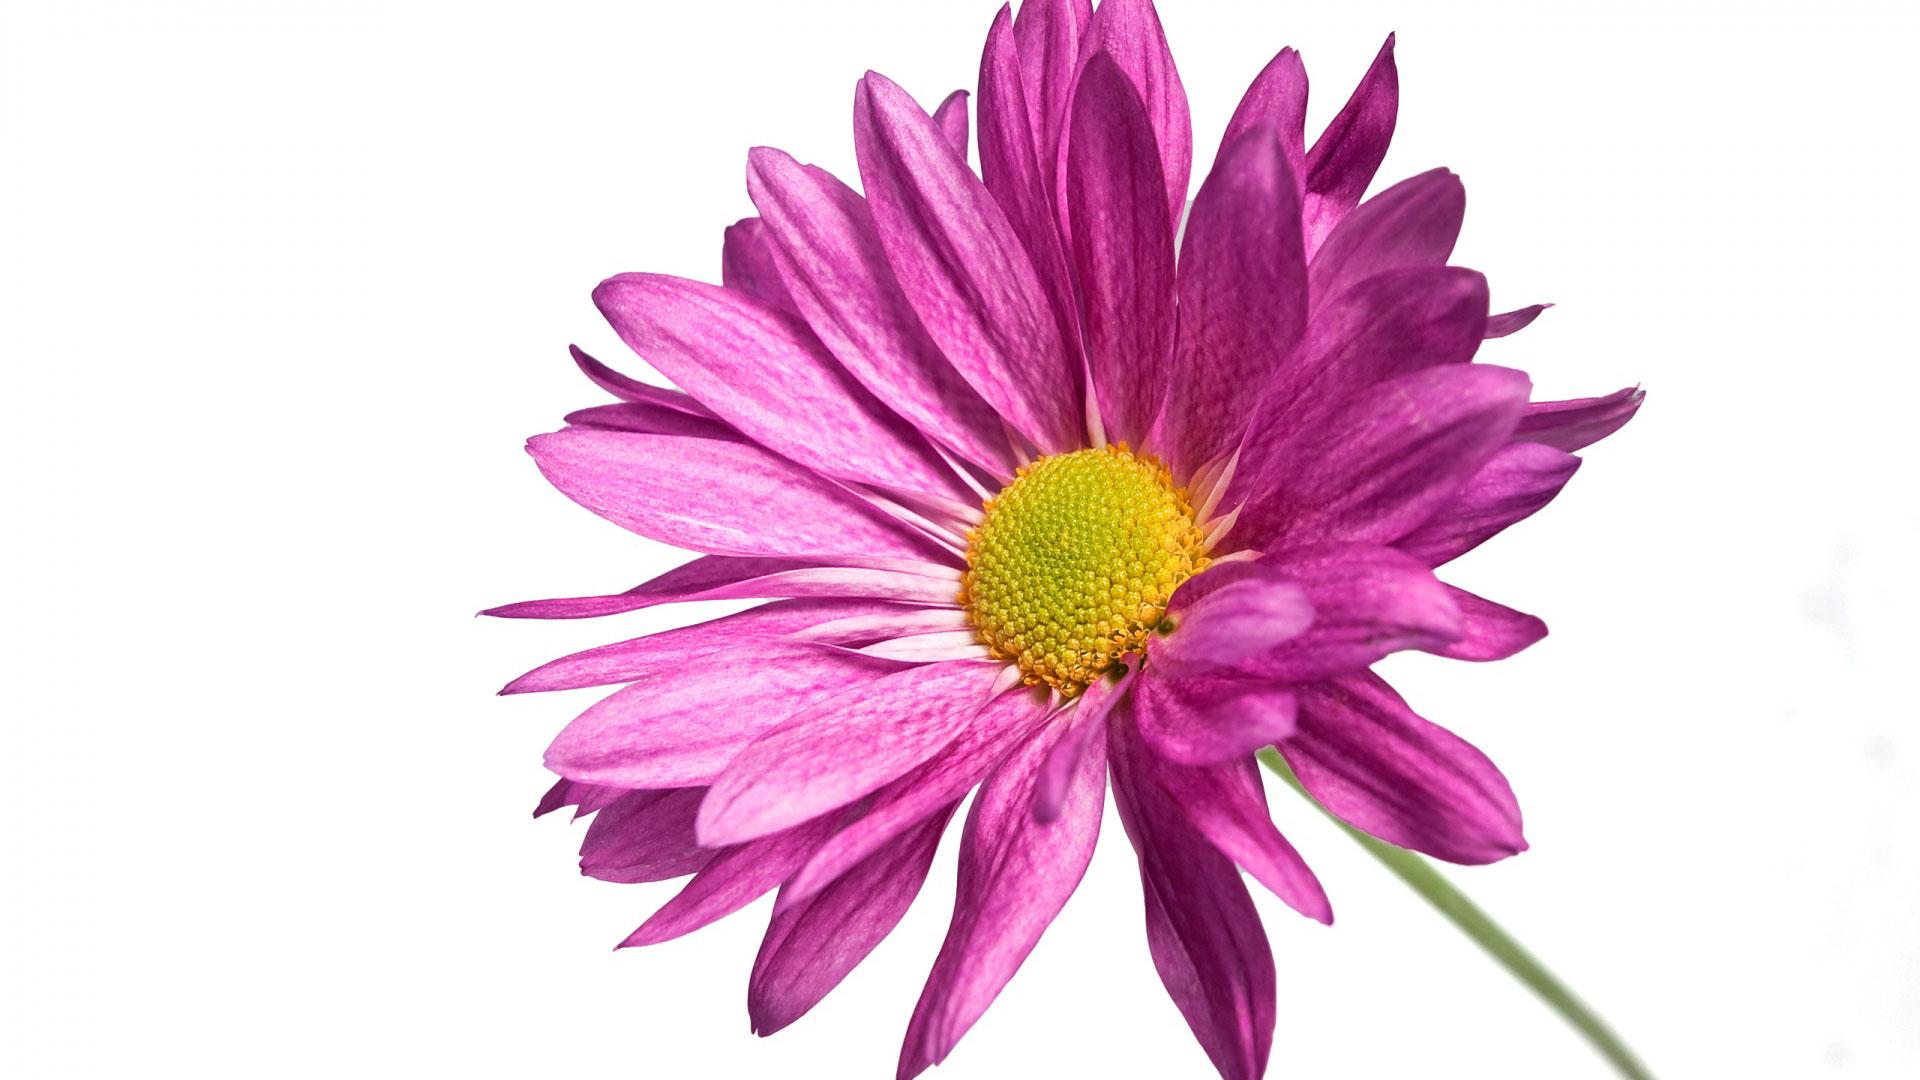 Pink Daisy 1080p - Pink Daisy PNG HD